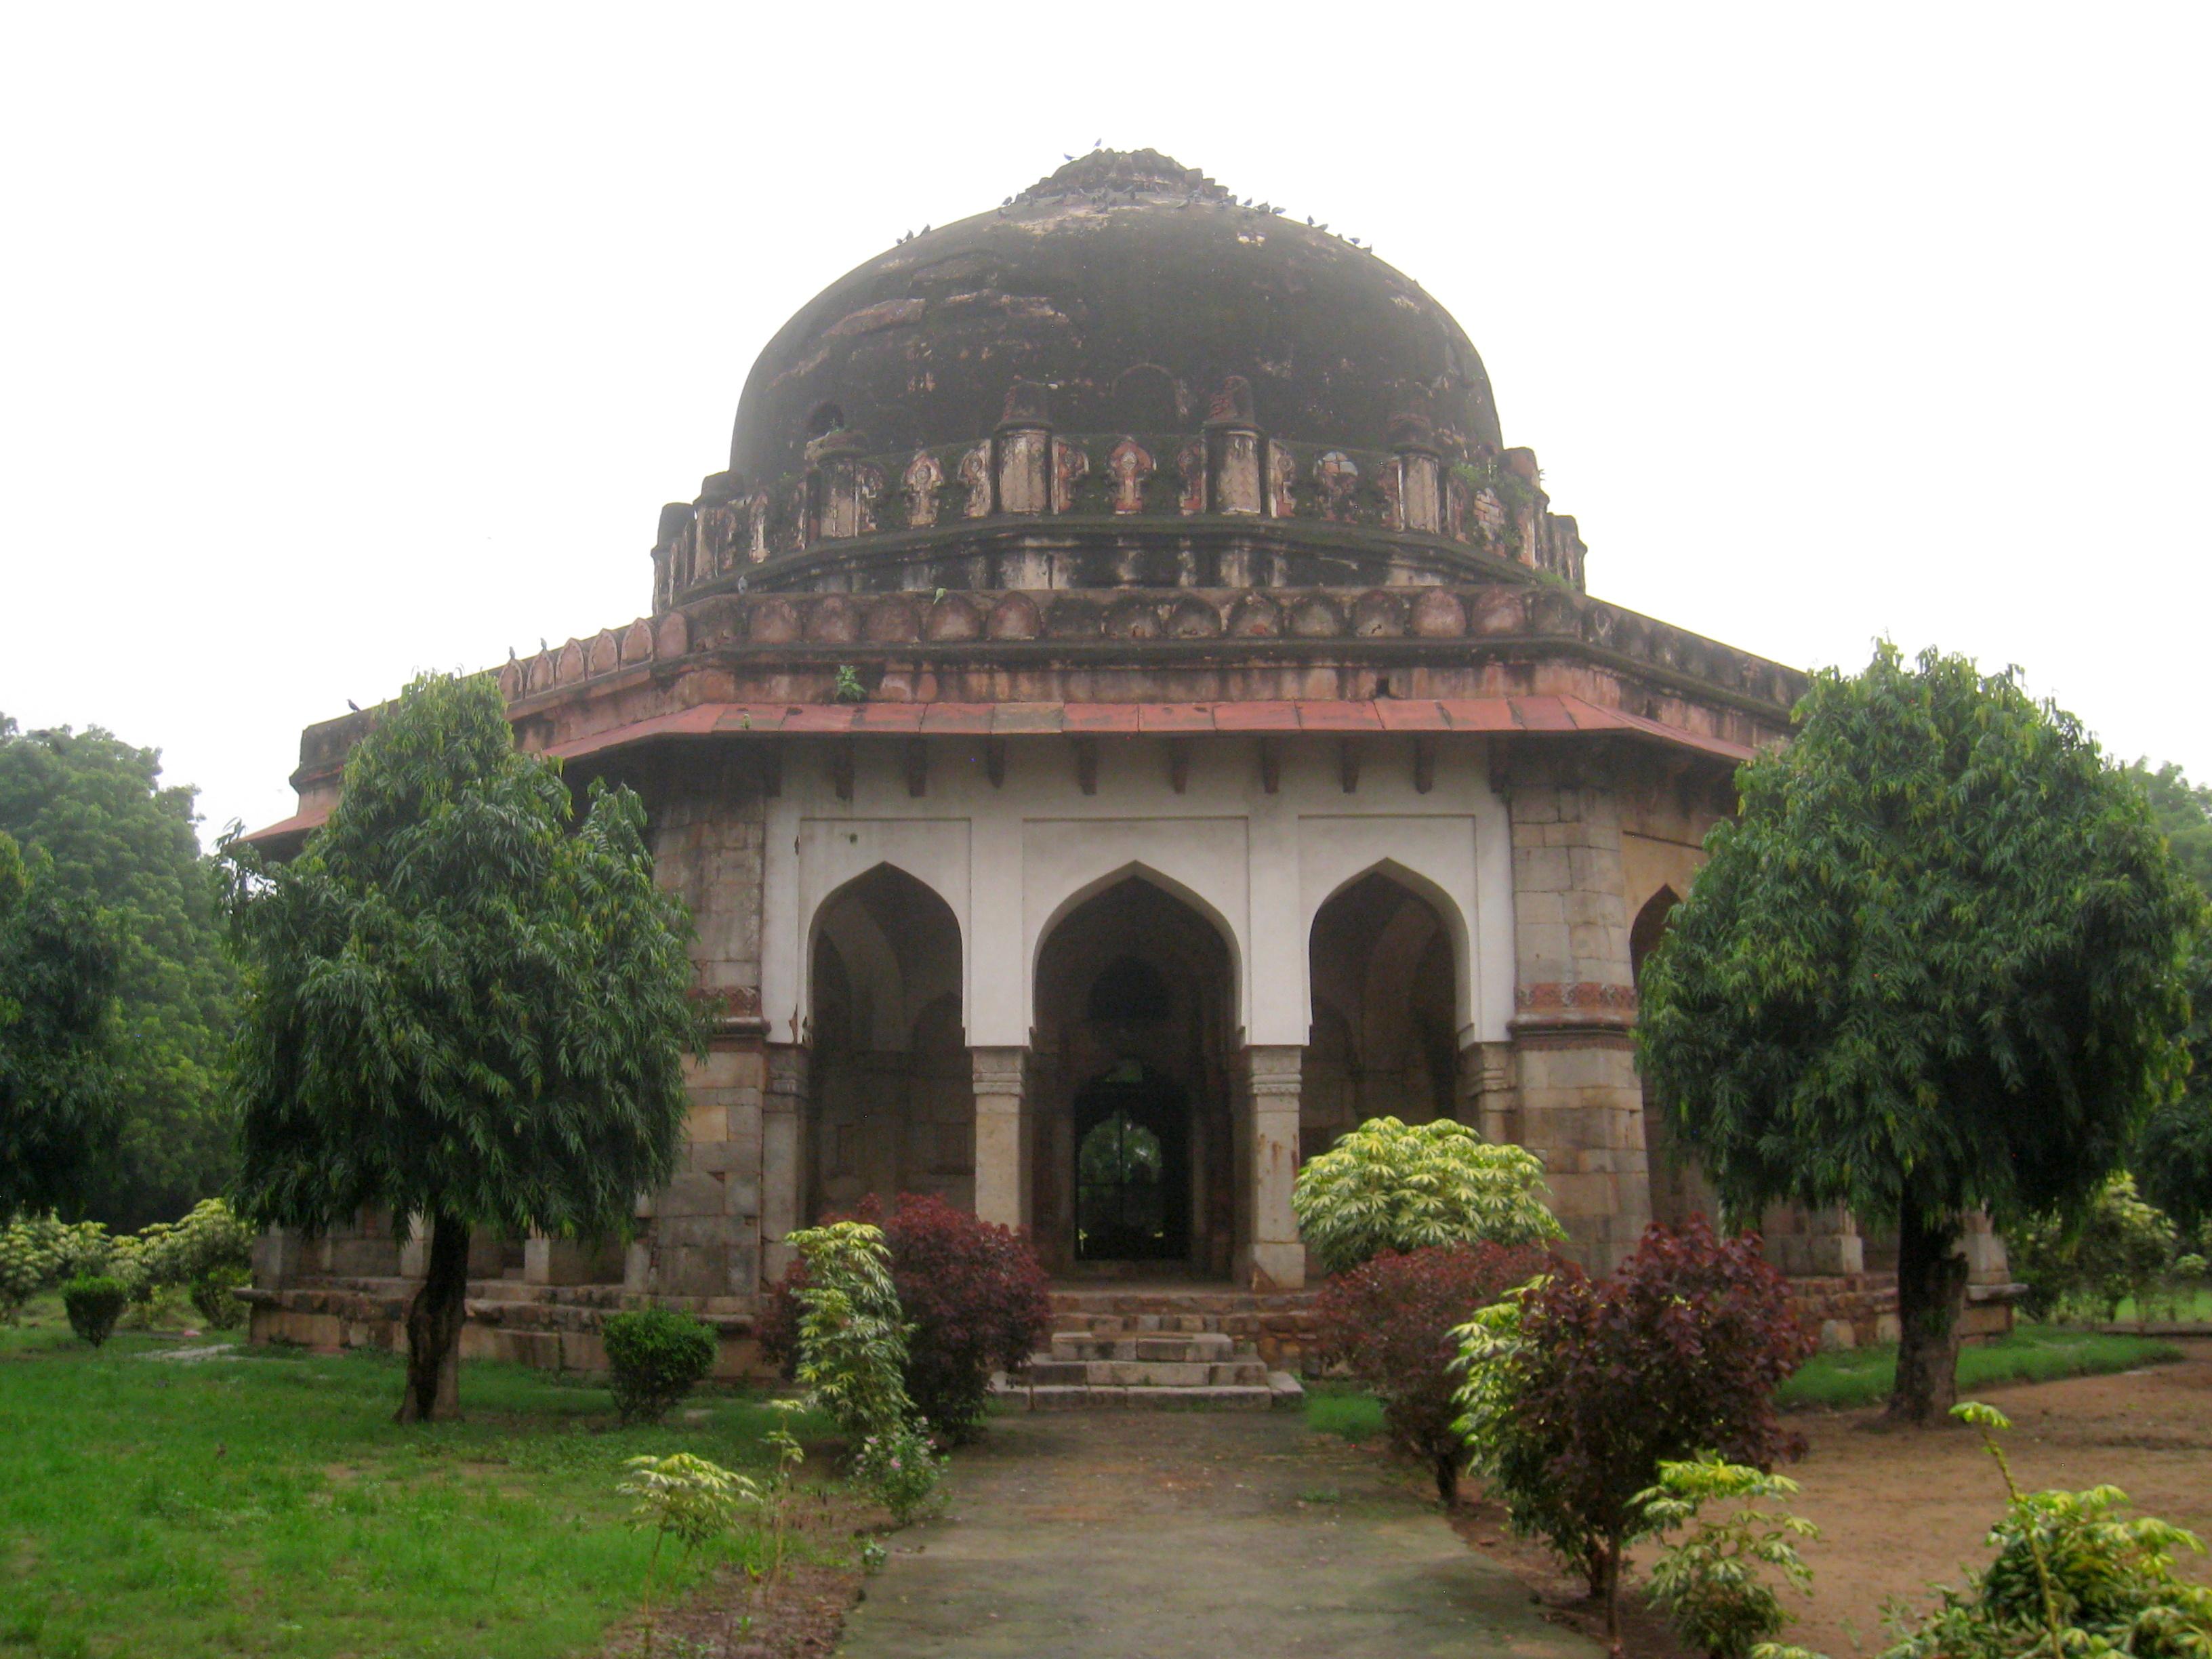 Sikander Lodhi's Tomb